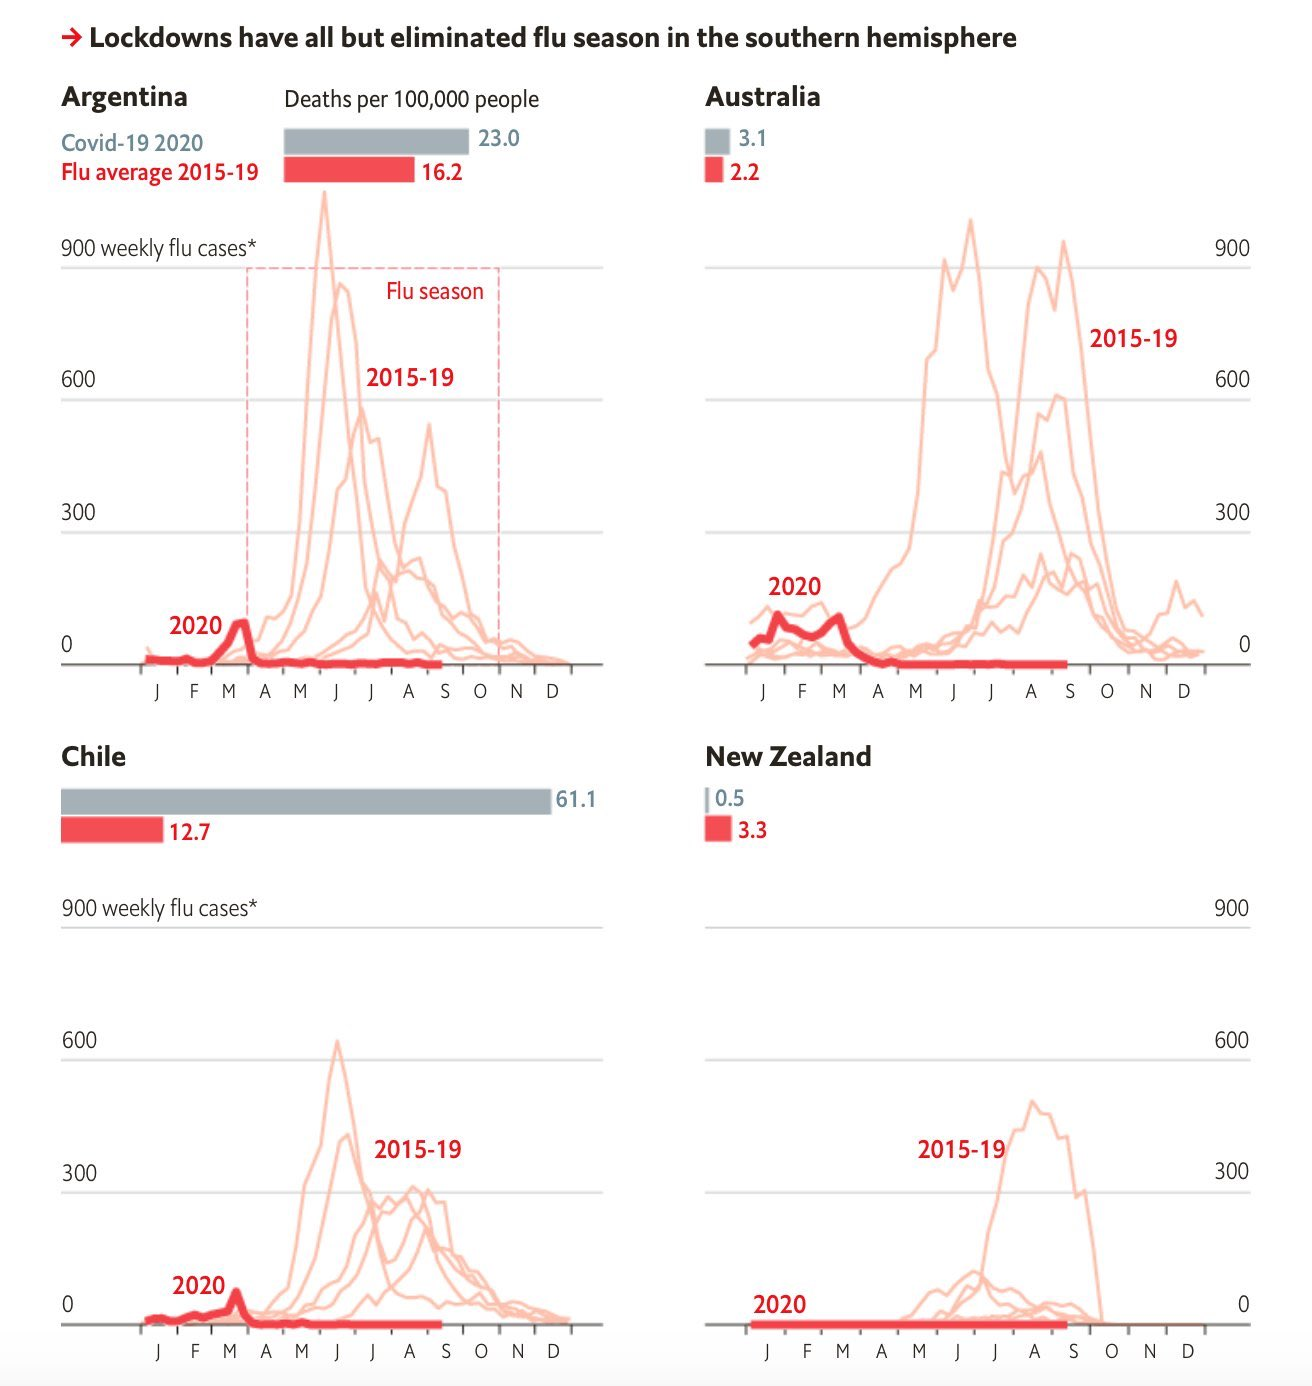 Imagen extraída de:  The Economist (12 Sept 2020)